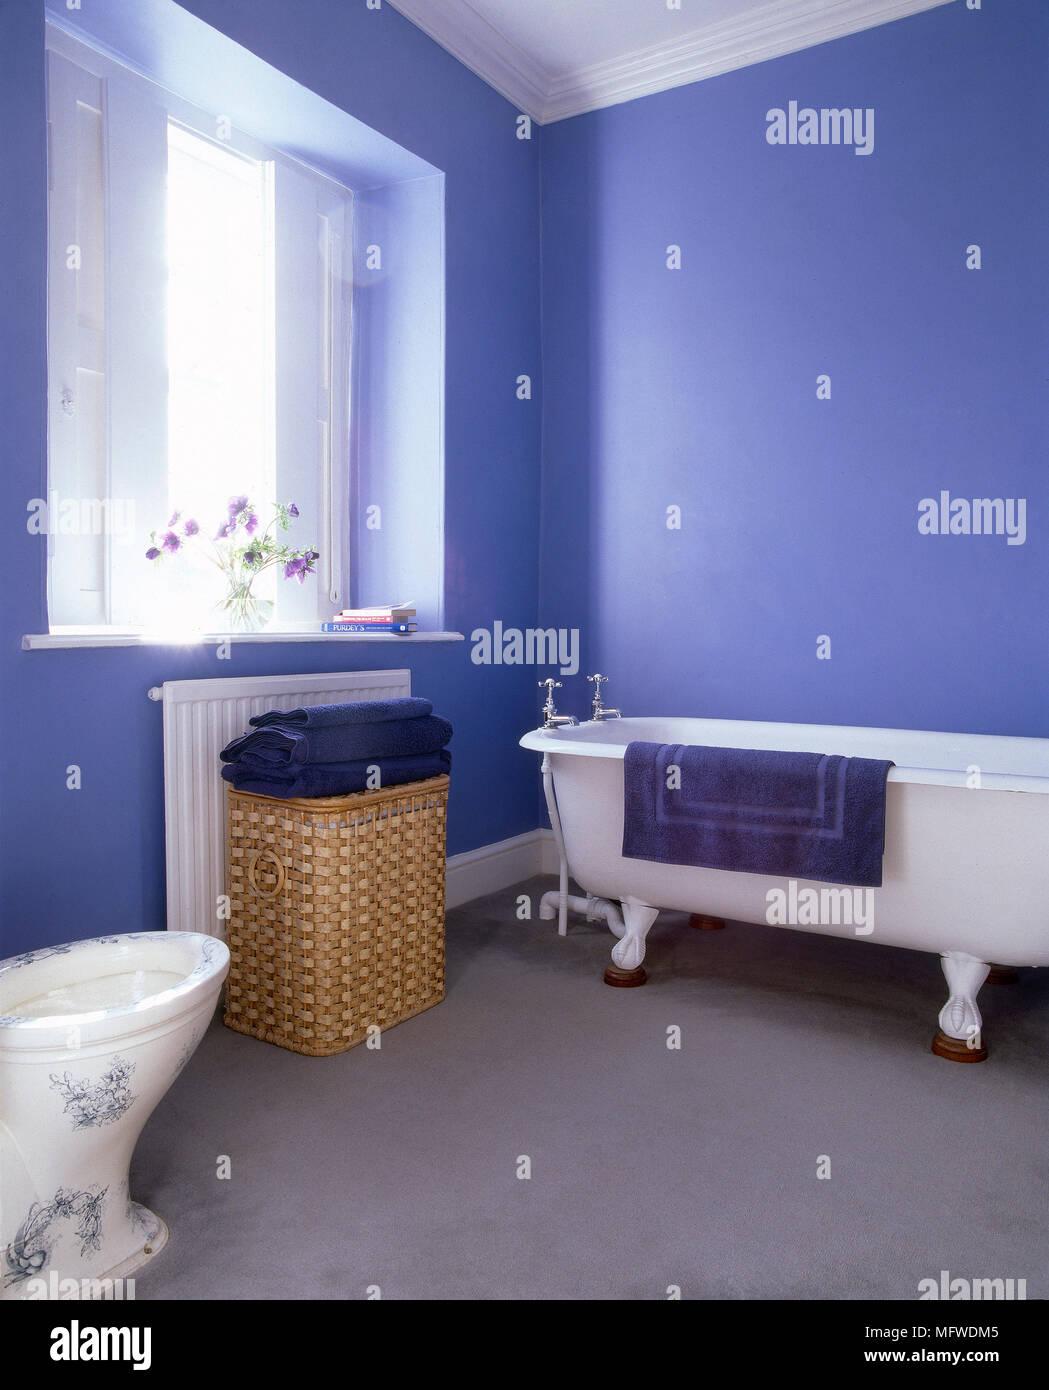 Nice Underscore Tub Photo - Bathtub Design Ideas - klotsnet.com